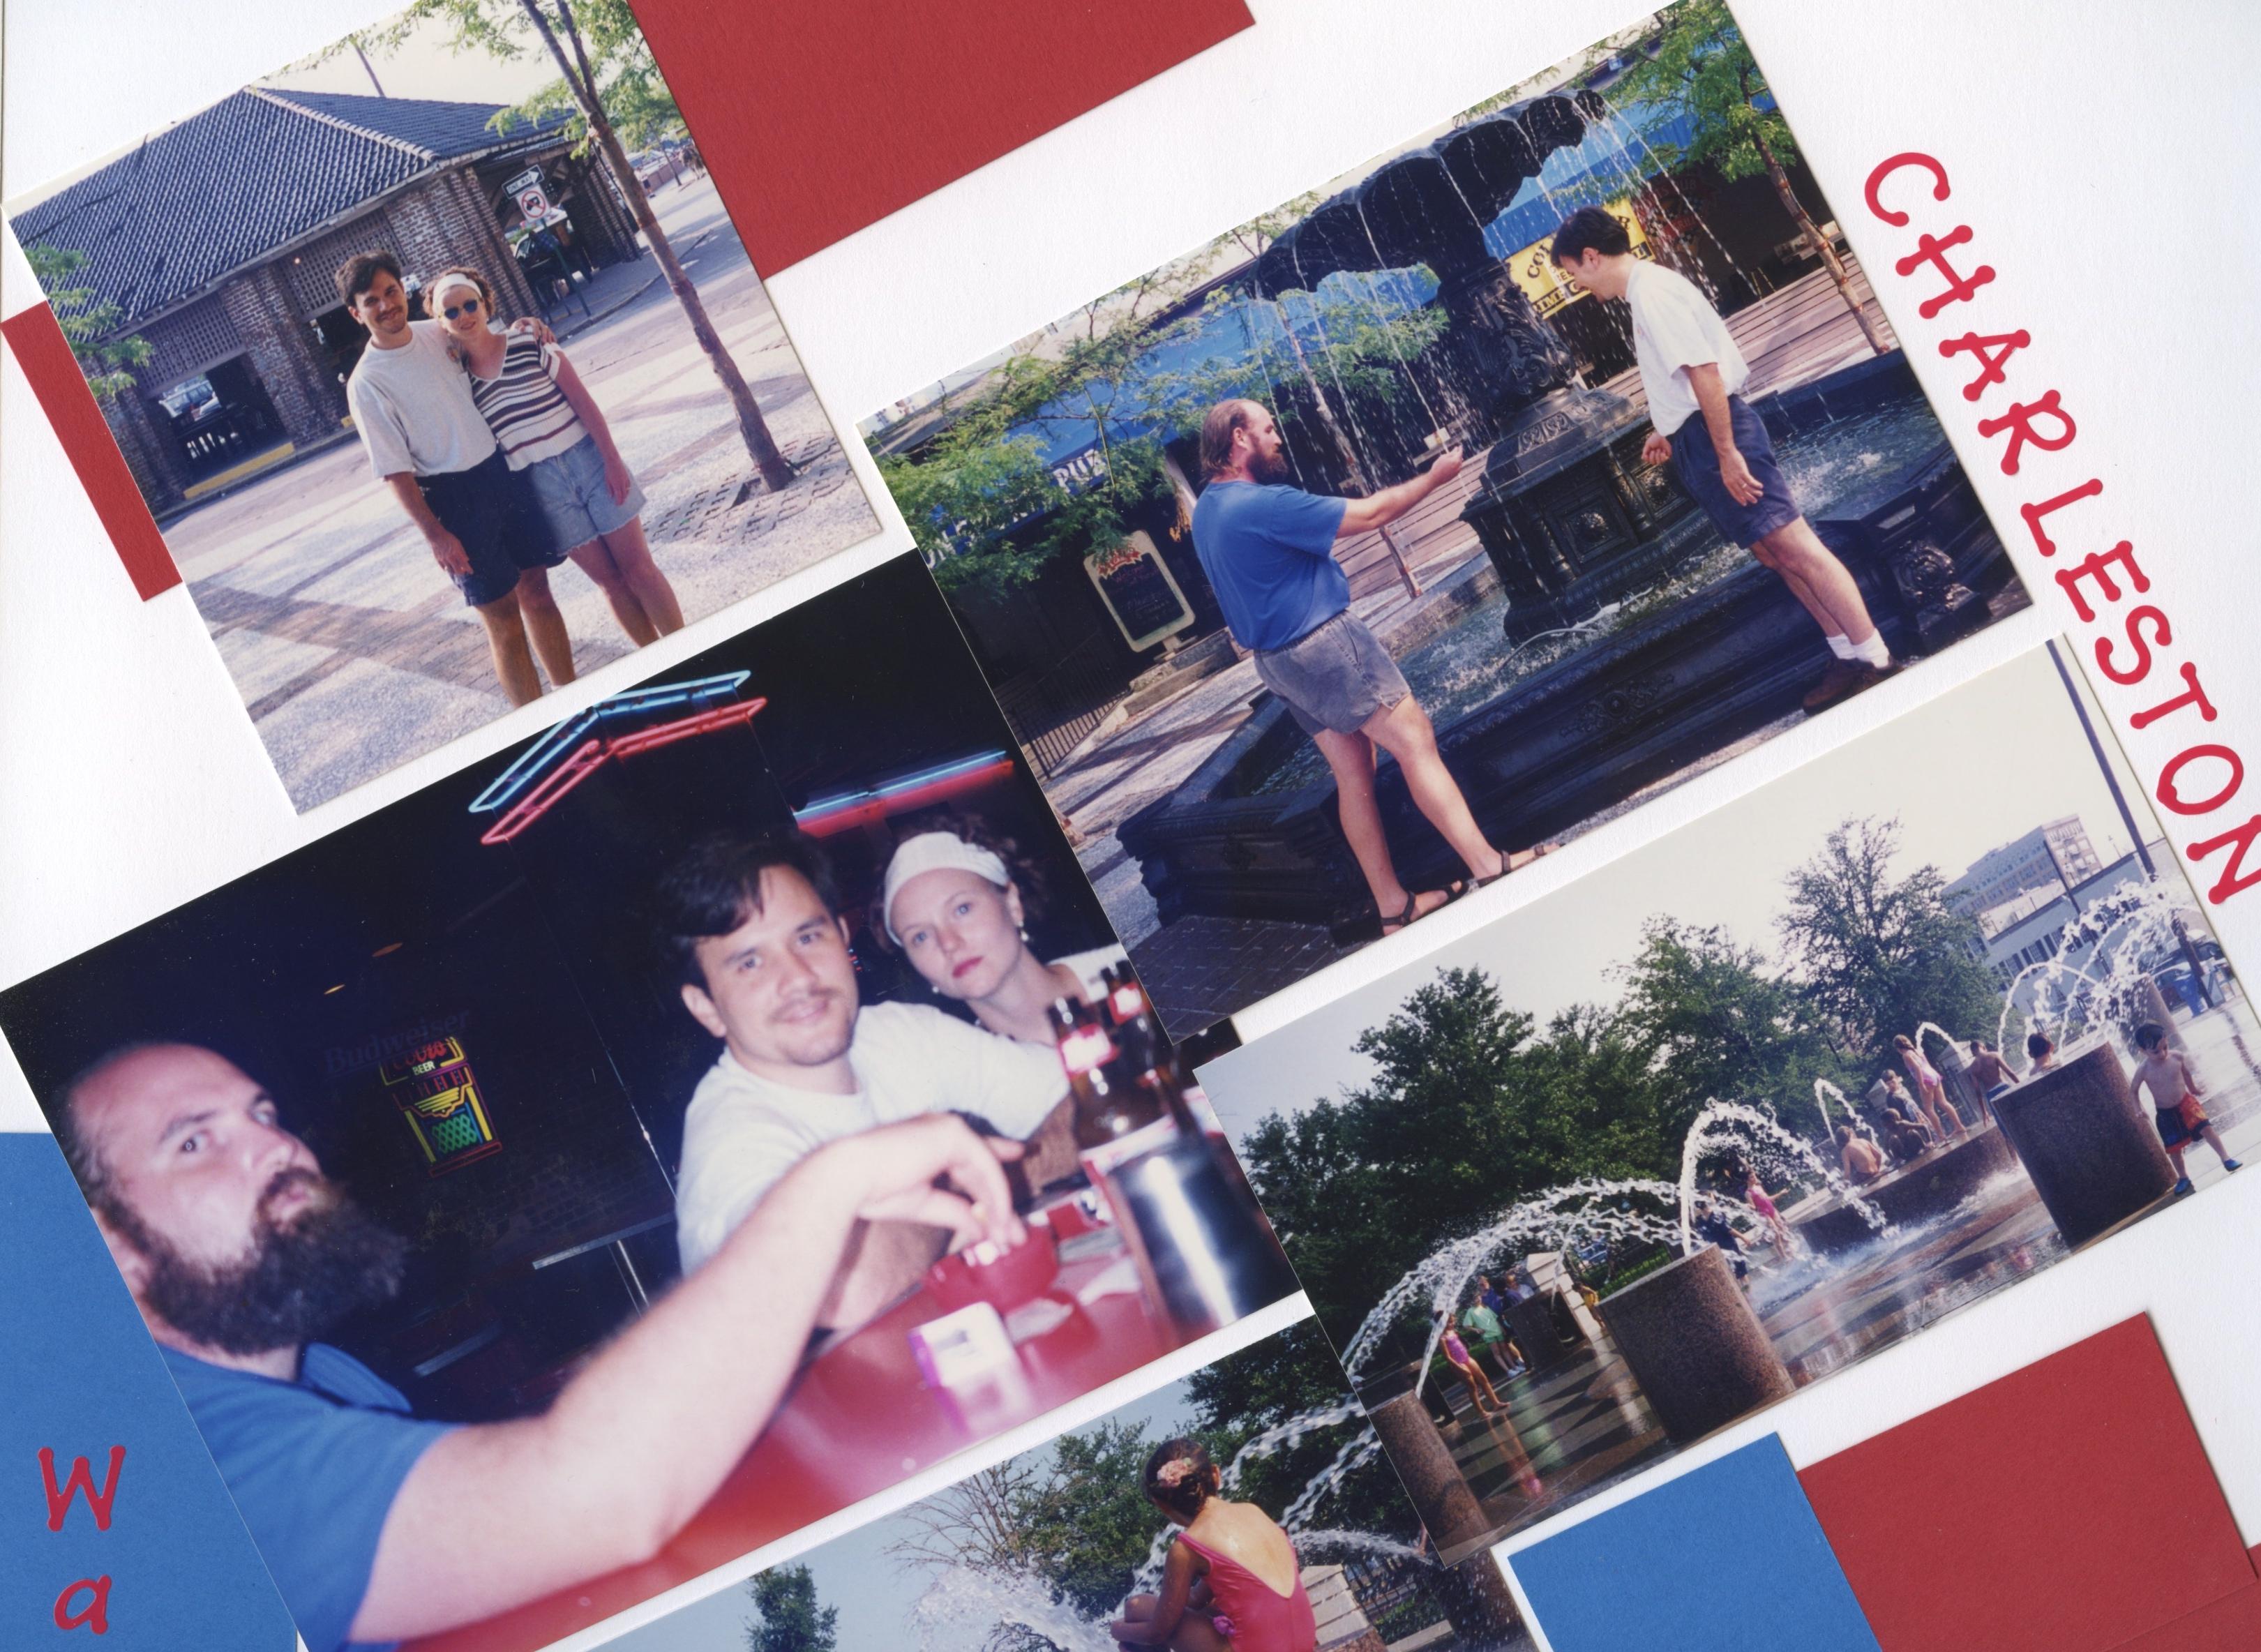 charleston-sc-trip-2-1995